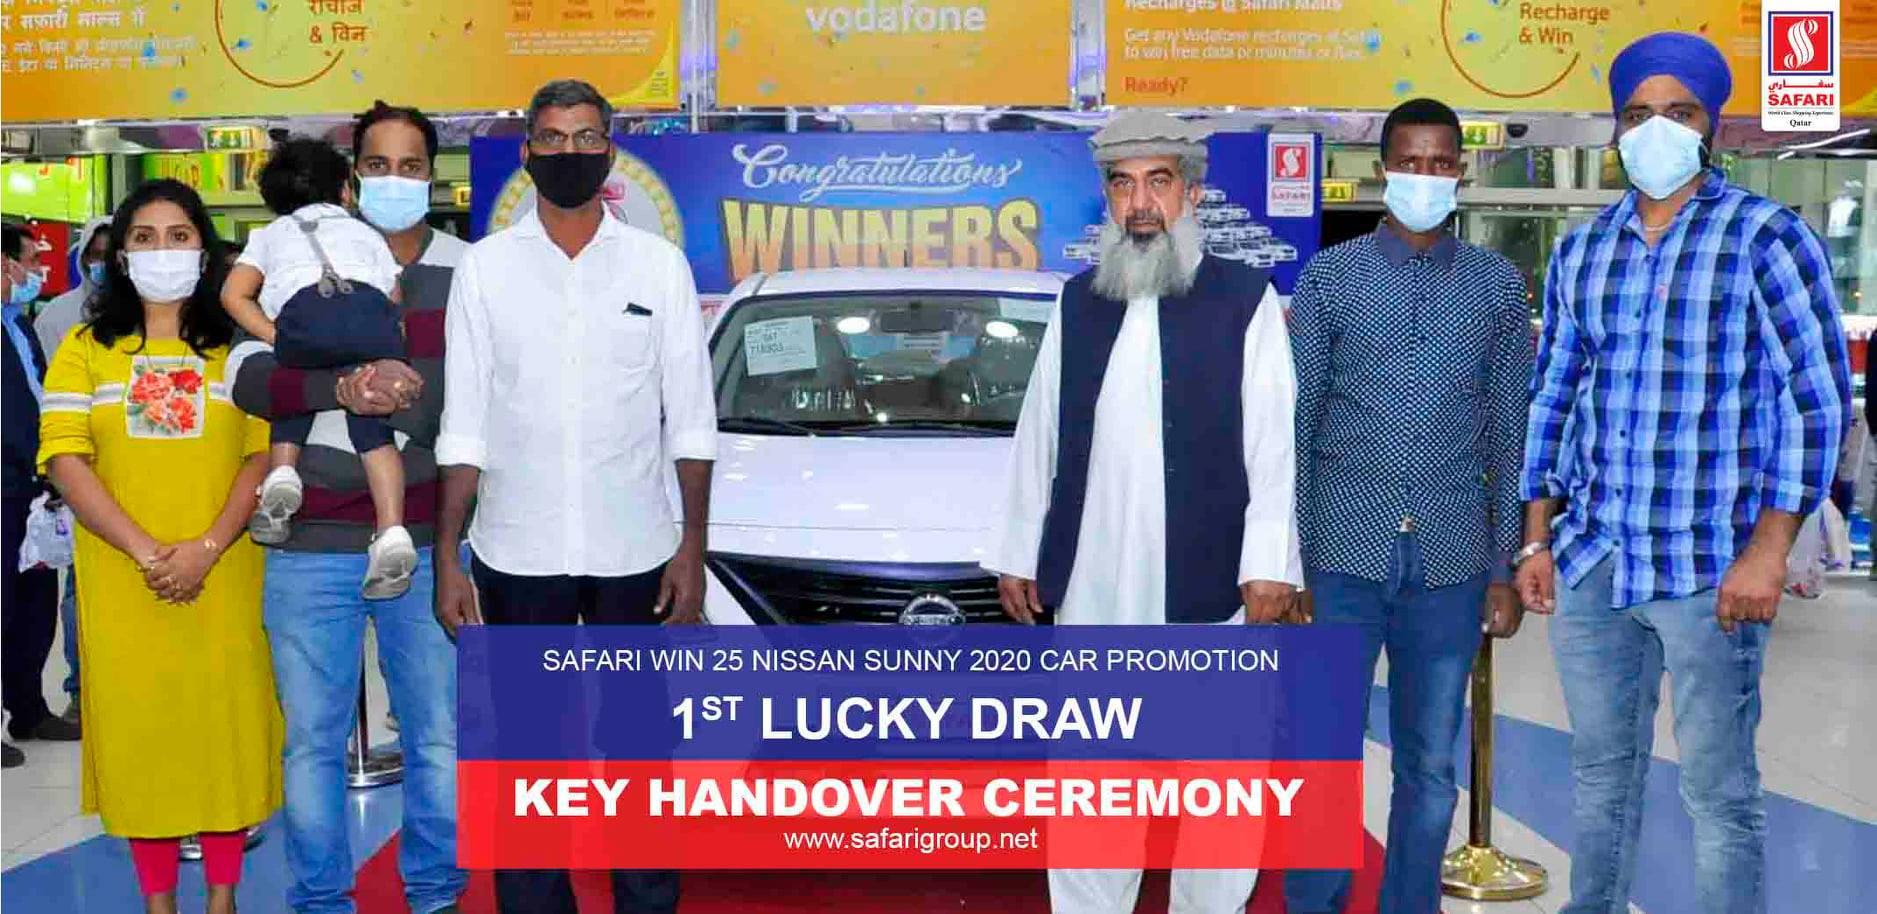 1st lucky draw winners